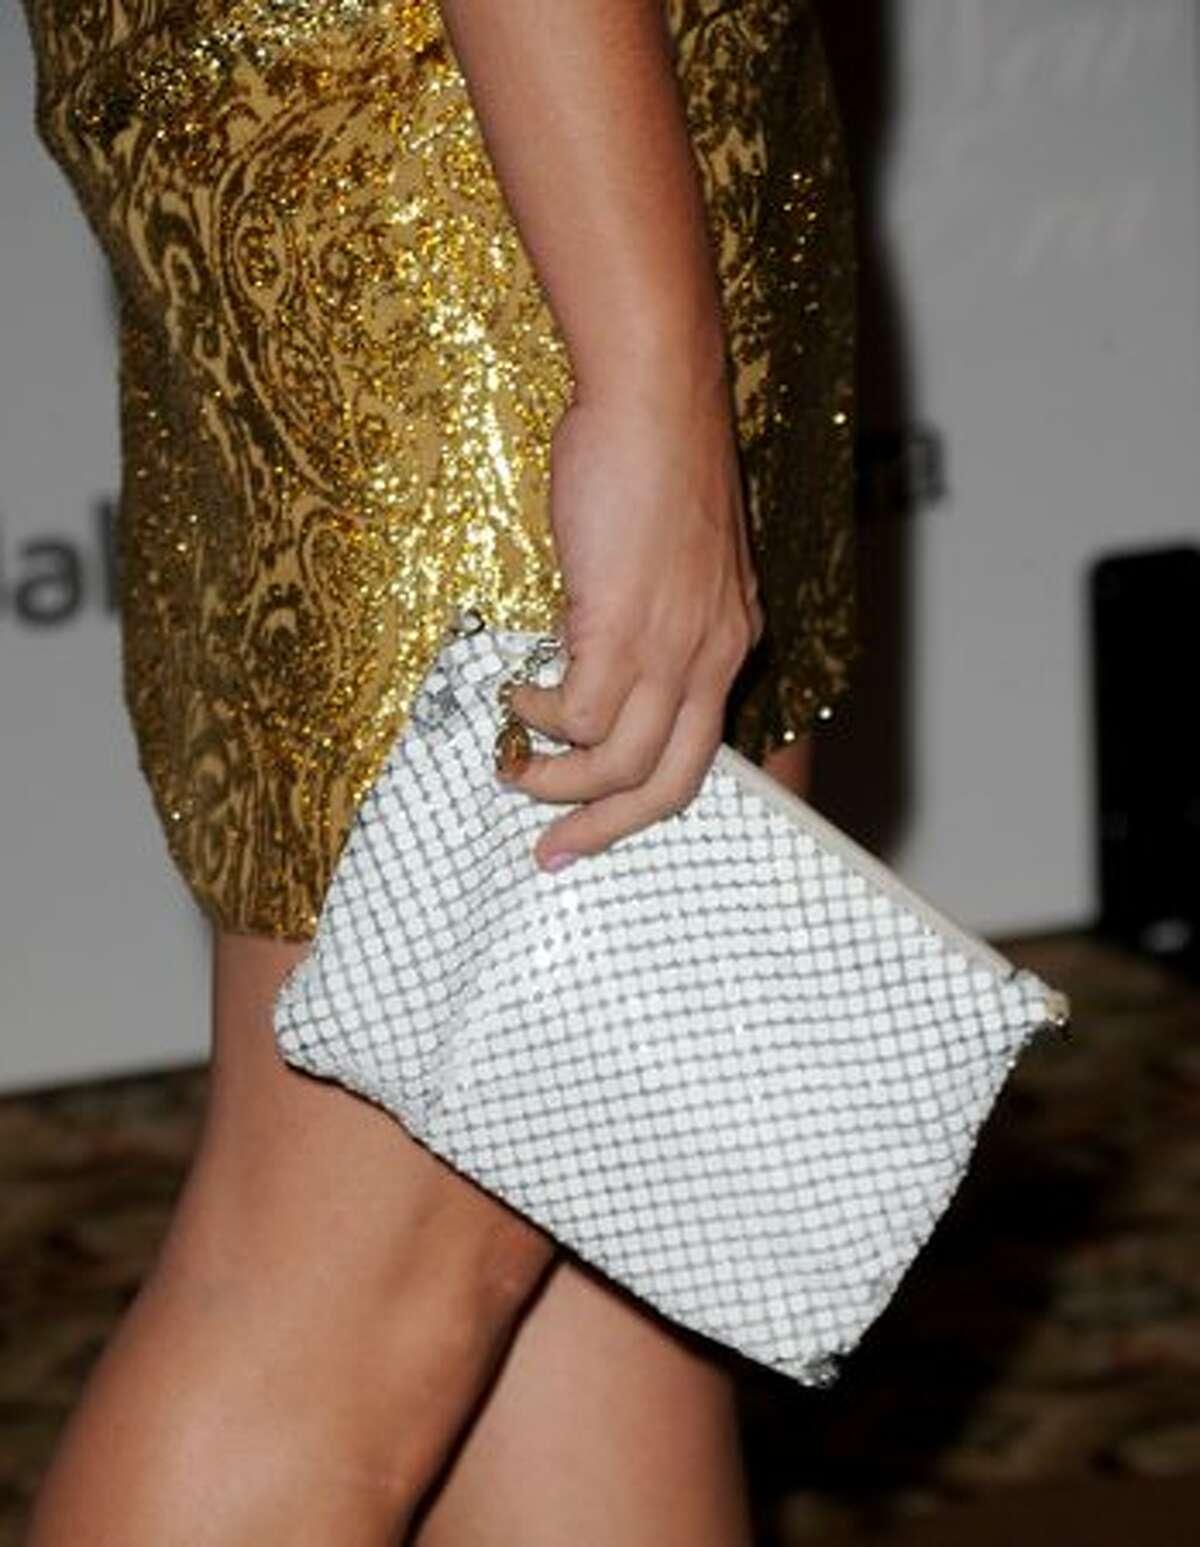 Actress Busy Philipps' handbag.